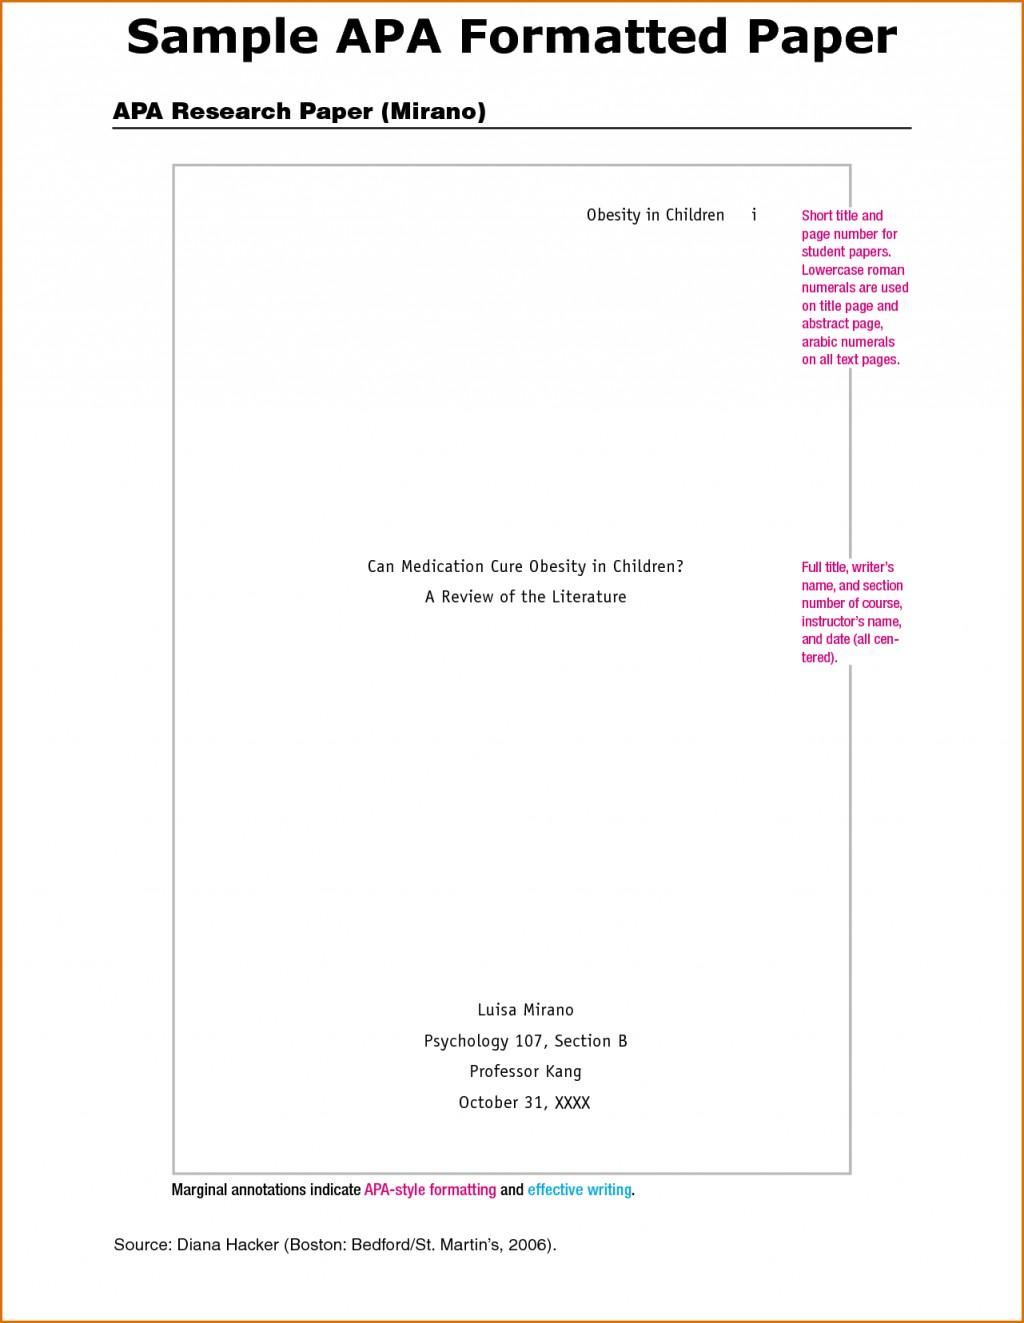 006 Apa Paper Template Iztn6rys Essay Example Stupendous Format Title Page Sample Pdf 2017 Large